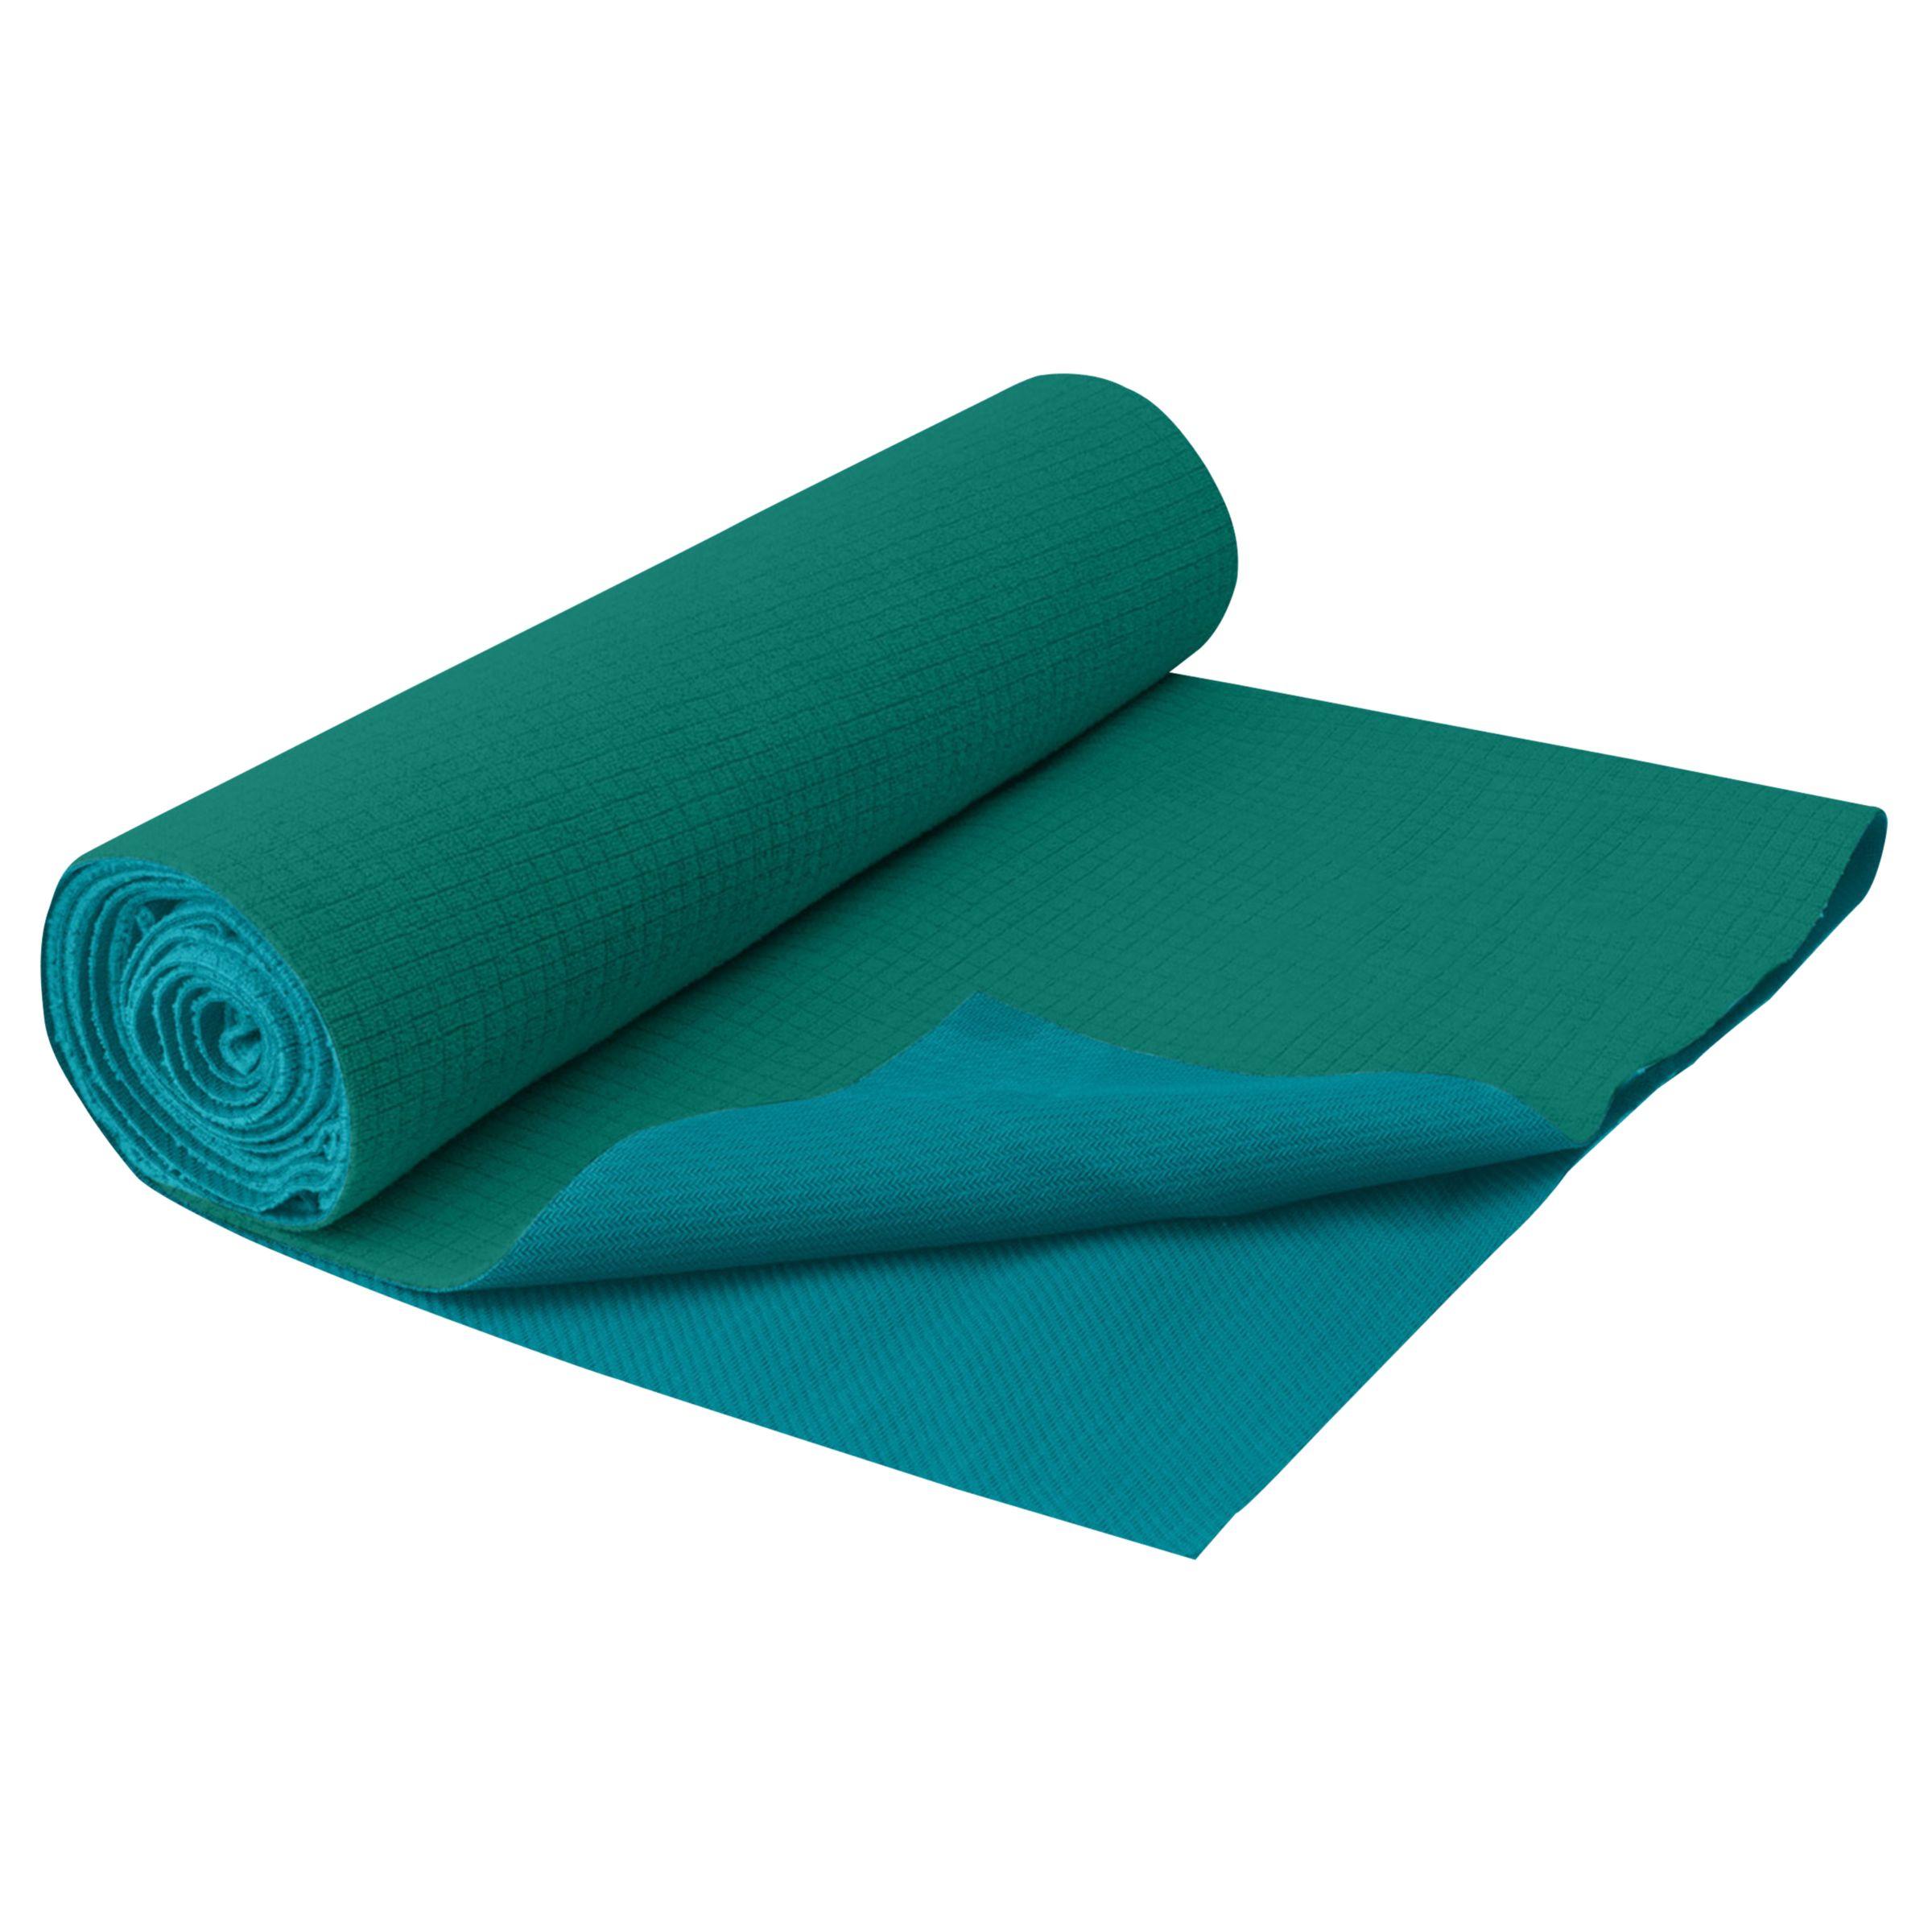 Gaiam Gaiam No-Slip Yoga Mat, Green